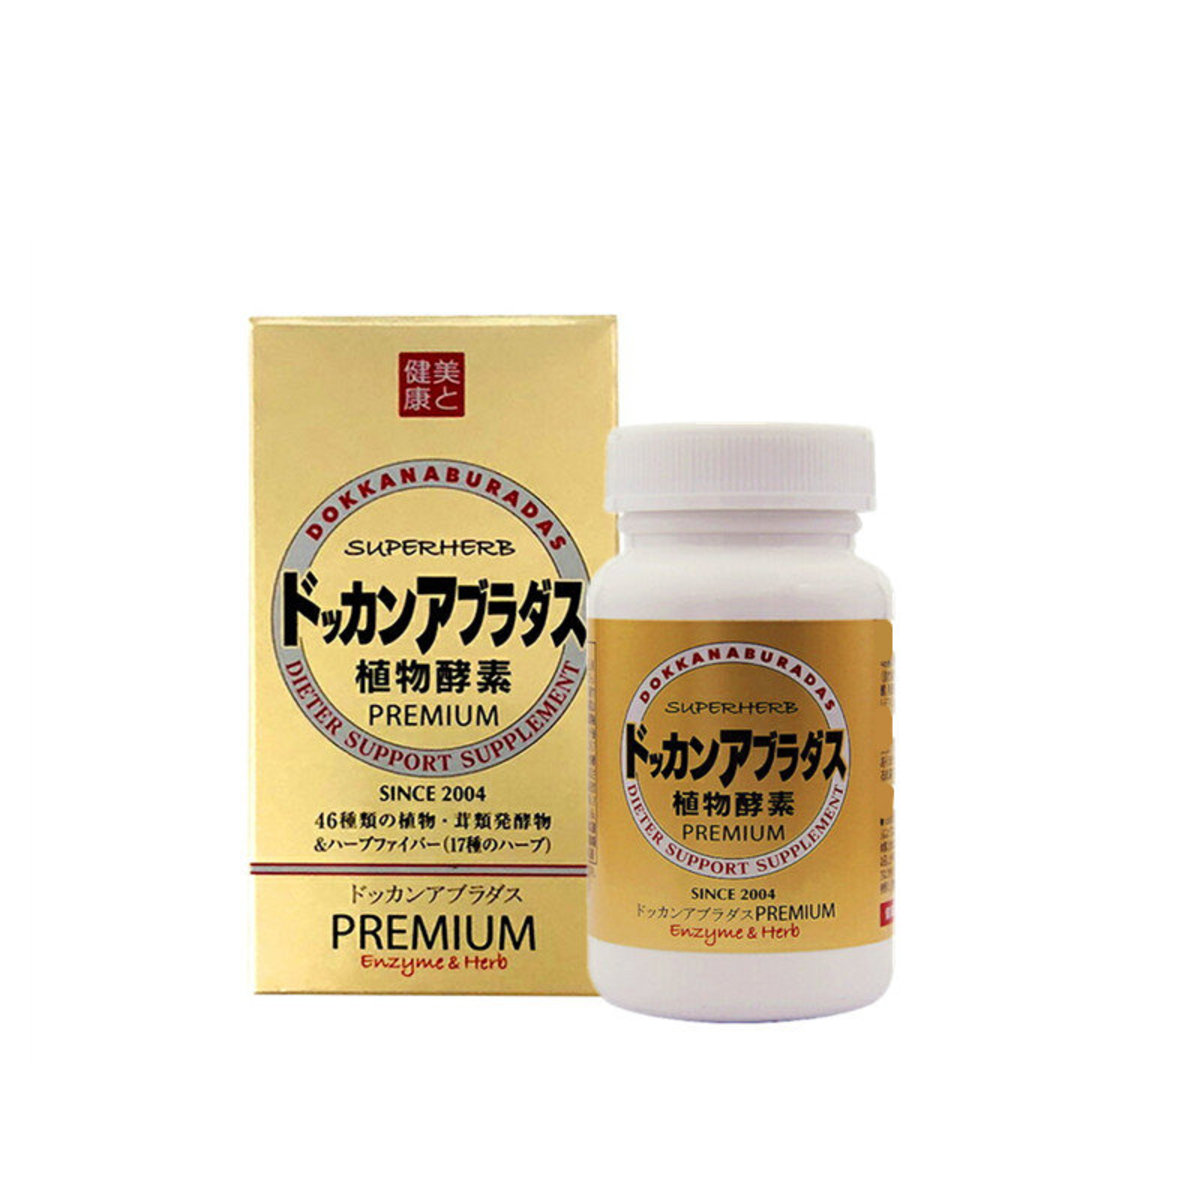 DOKKAN ABURA PREMIUM 180粒 升級加量版夜間植物酵素